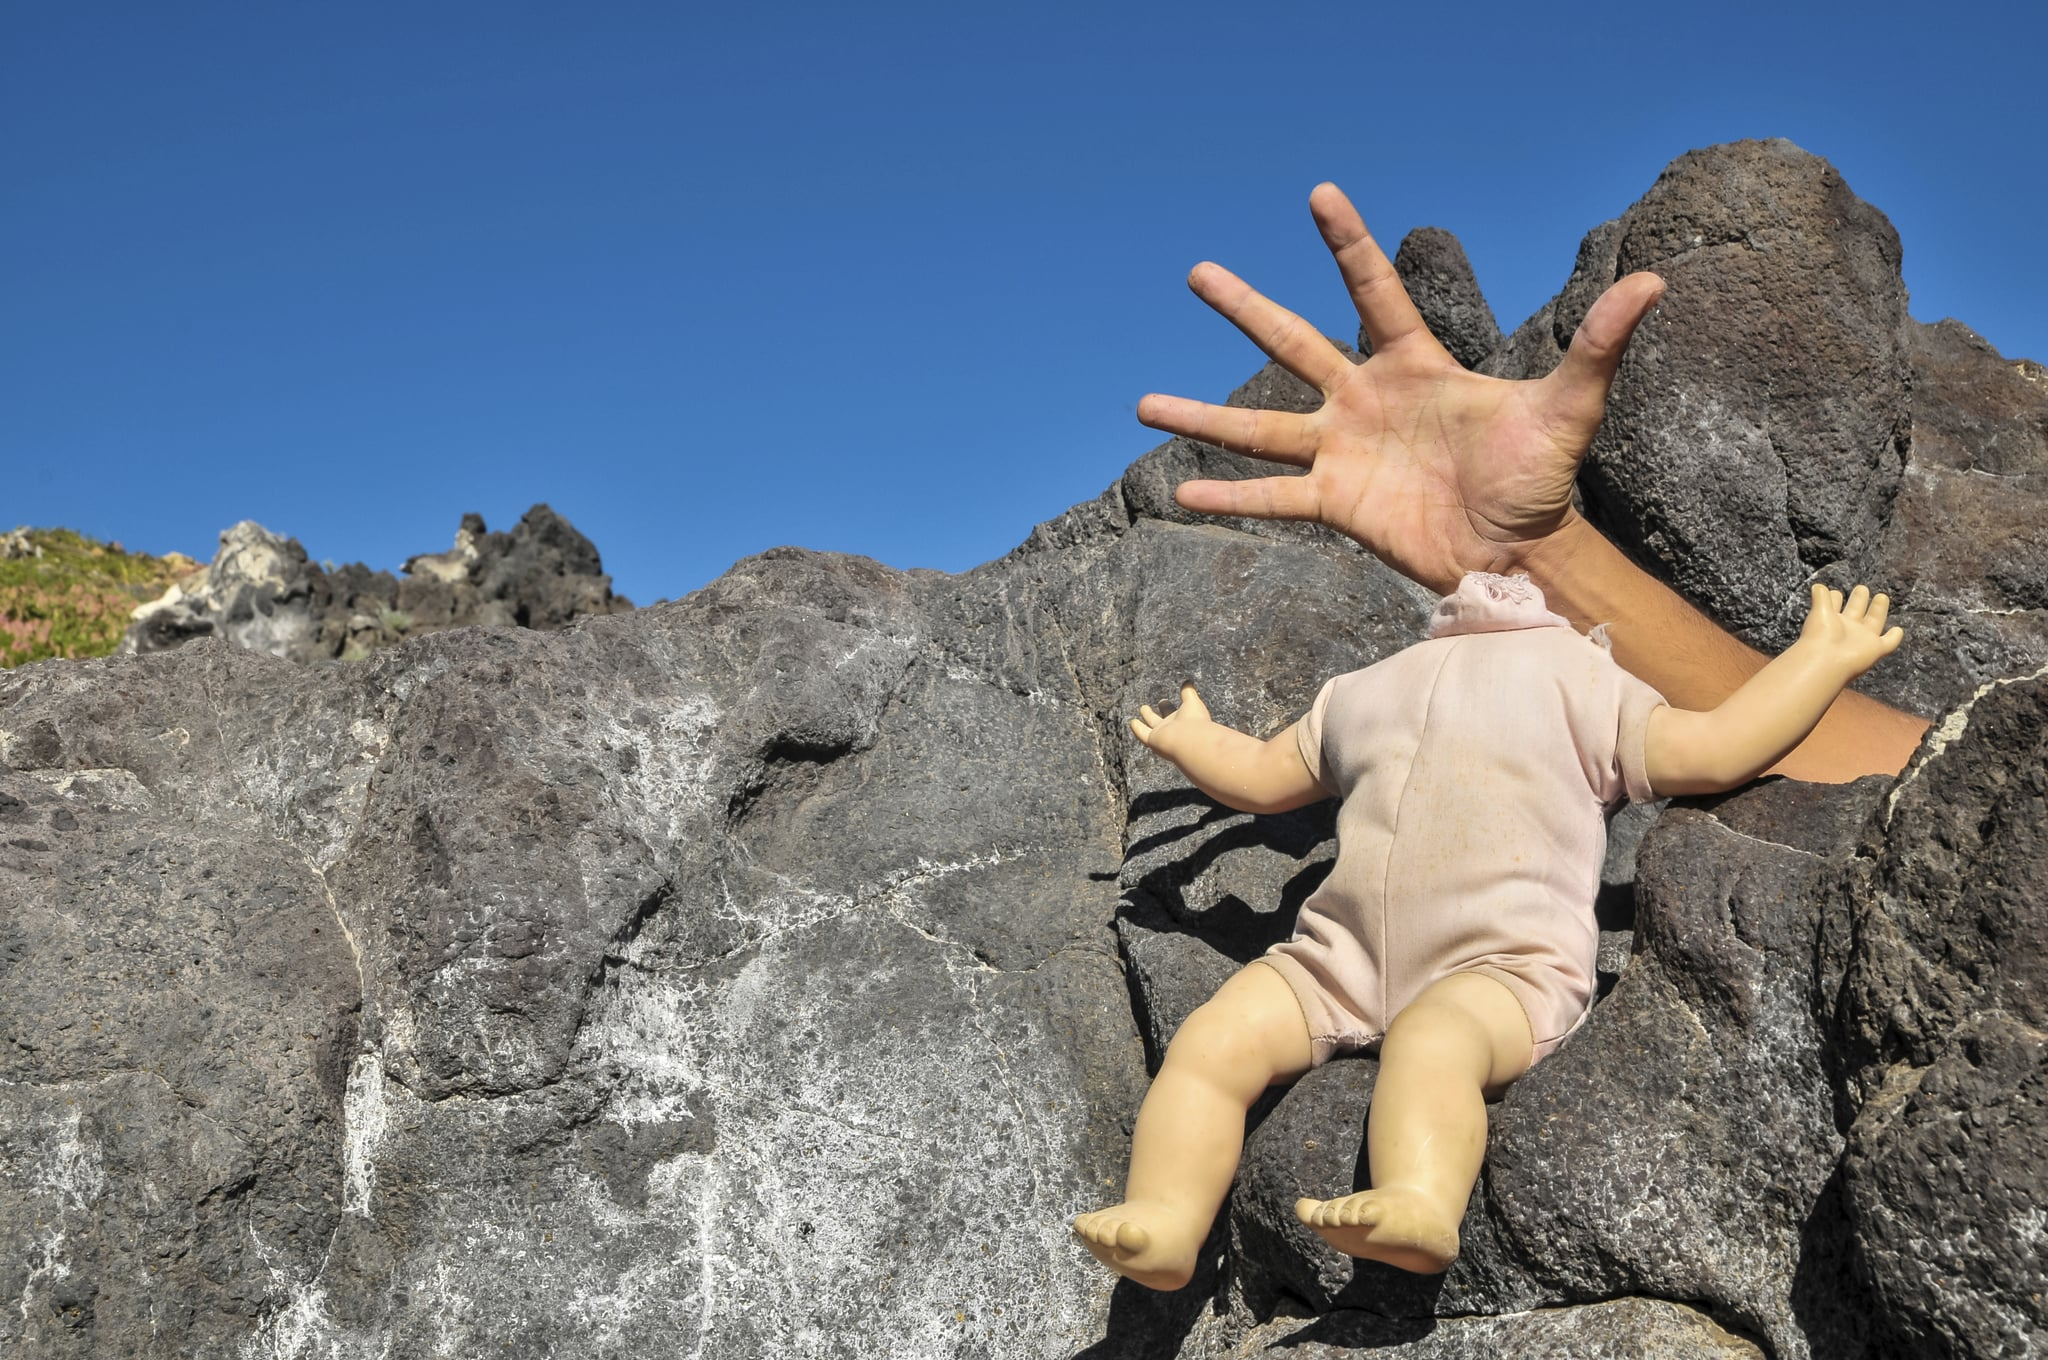 Wait, that's not Mount Rushmore . . .